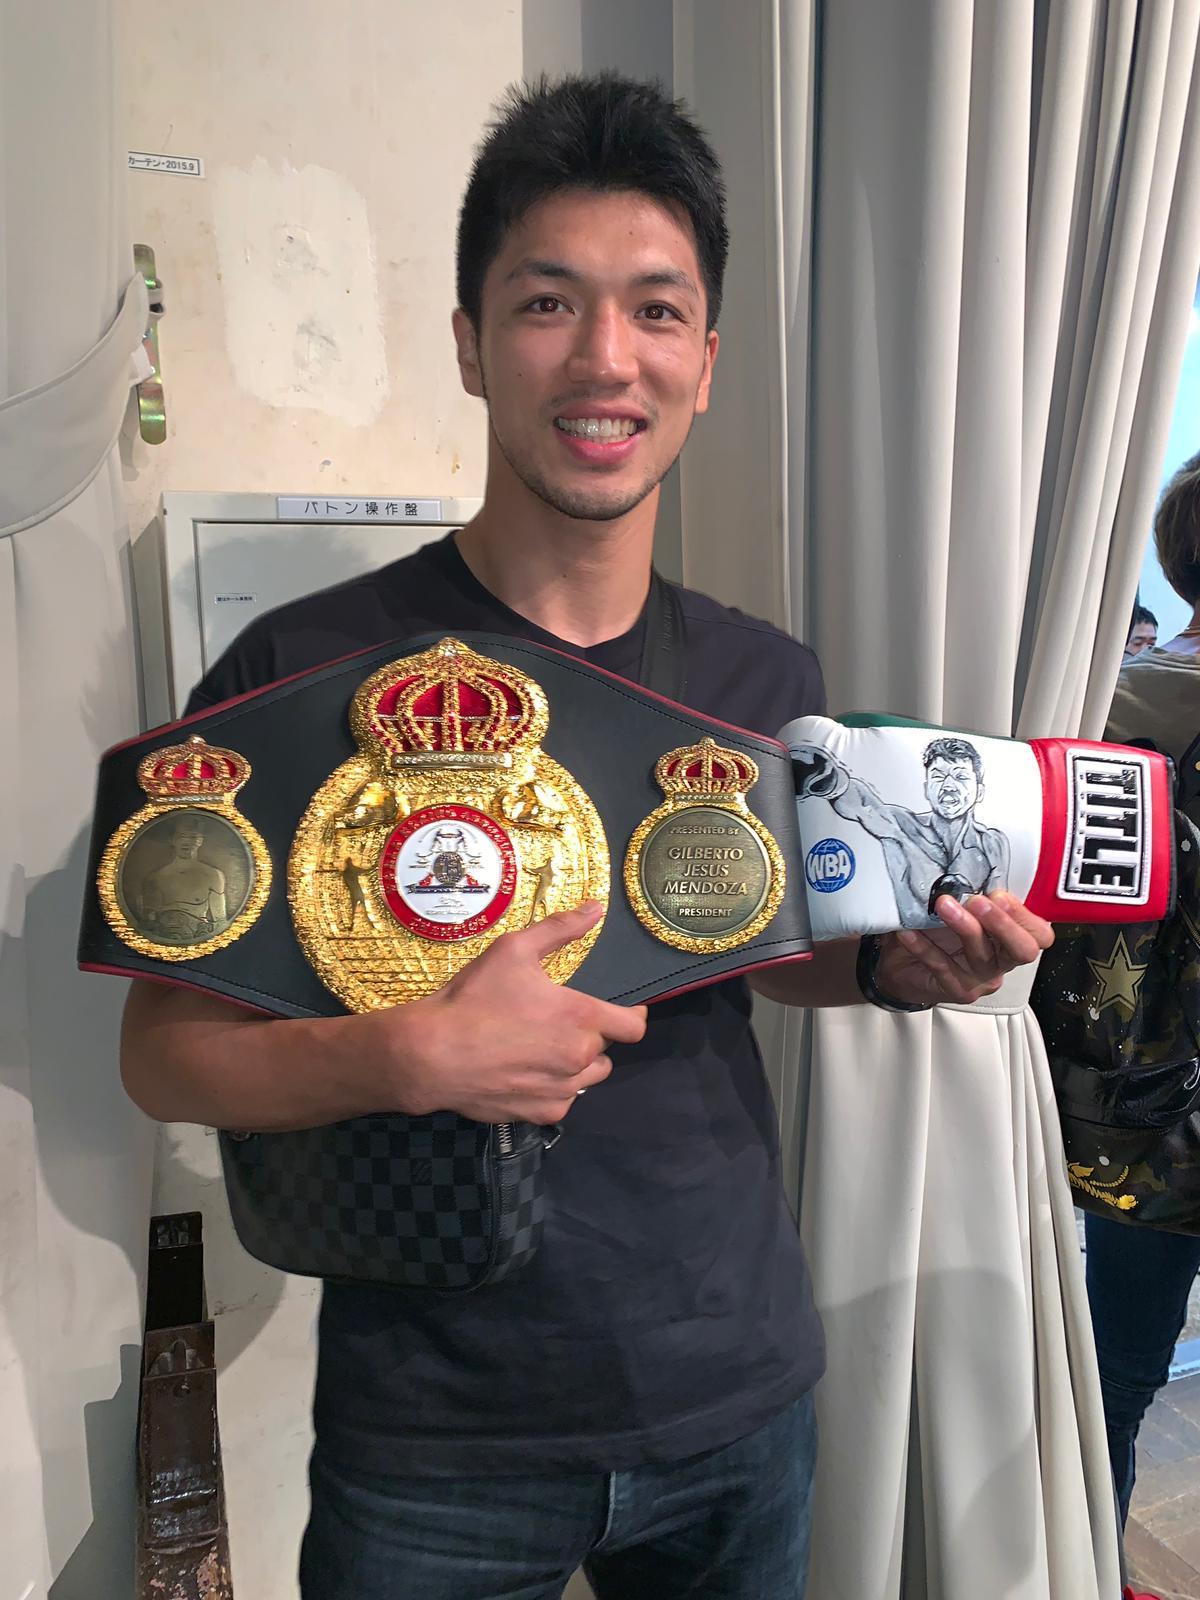 Ryota Murata «ascendido» a super campeón mediano AMB